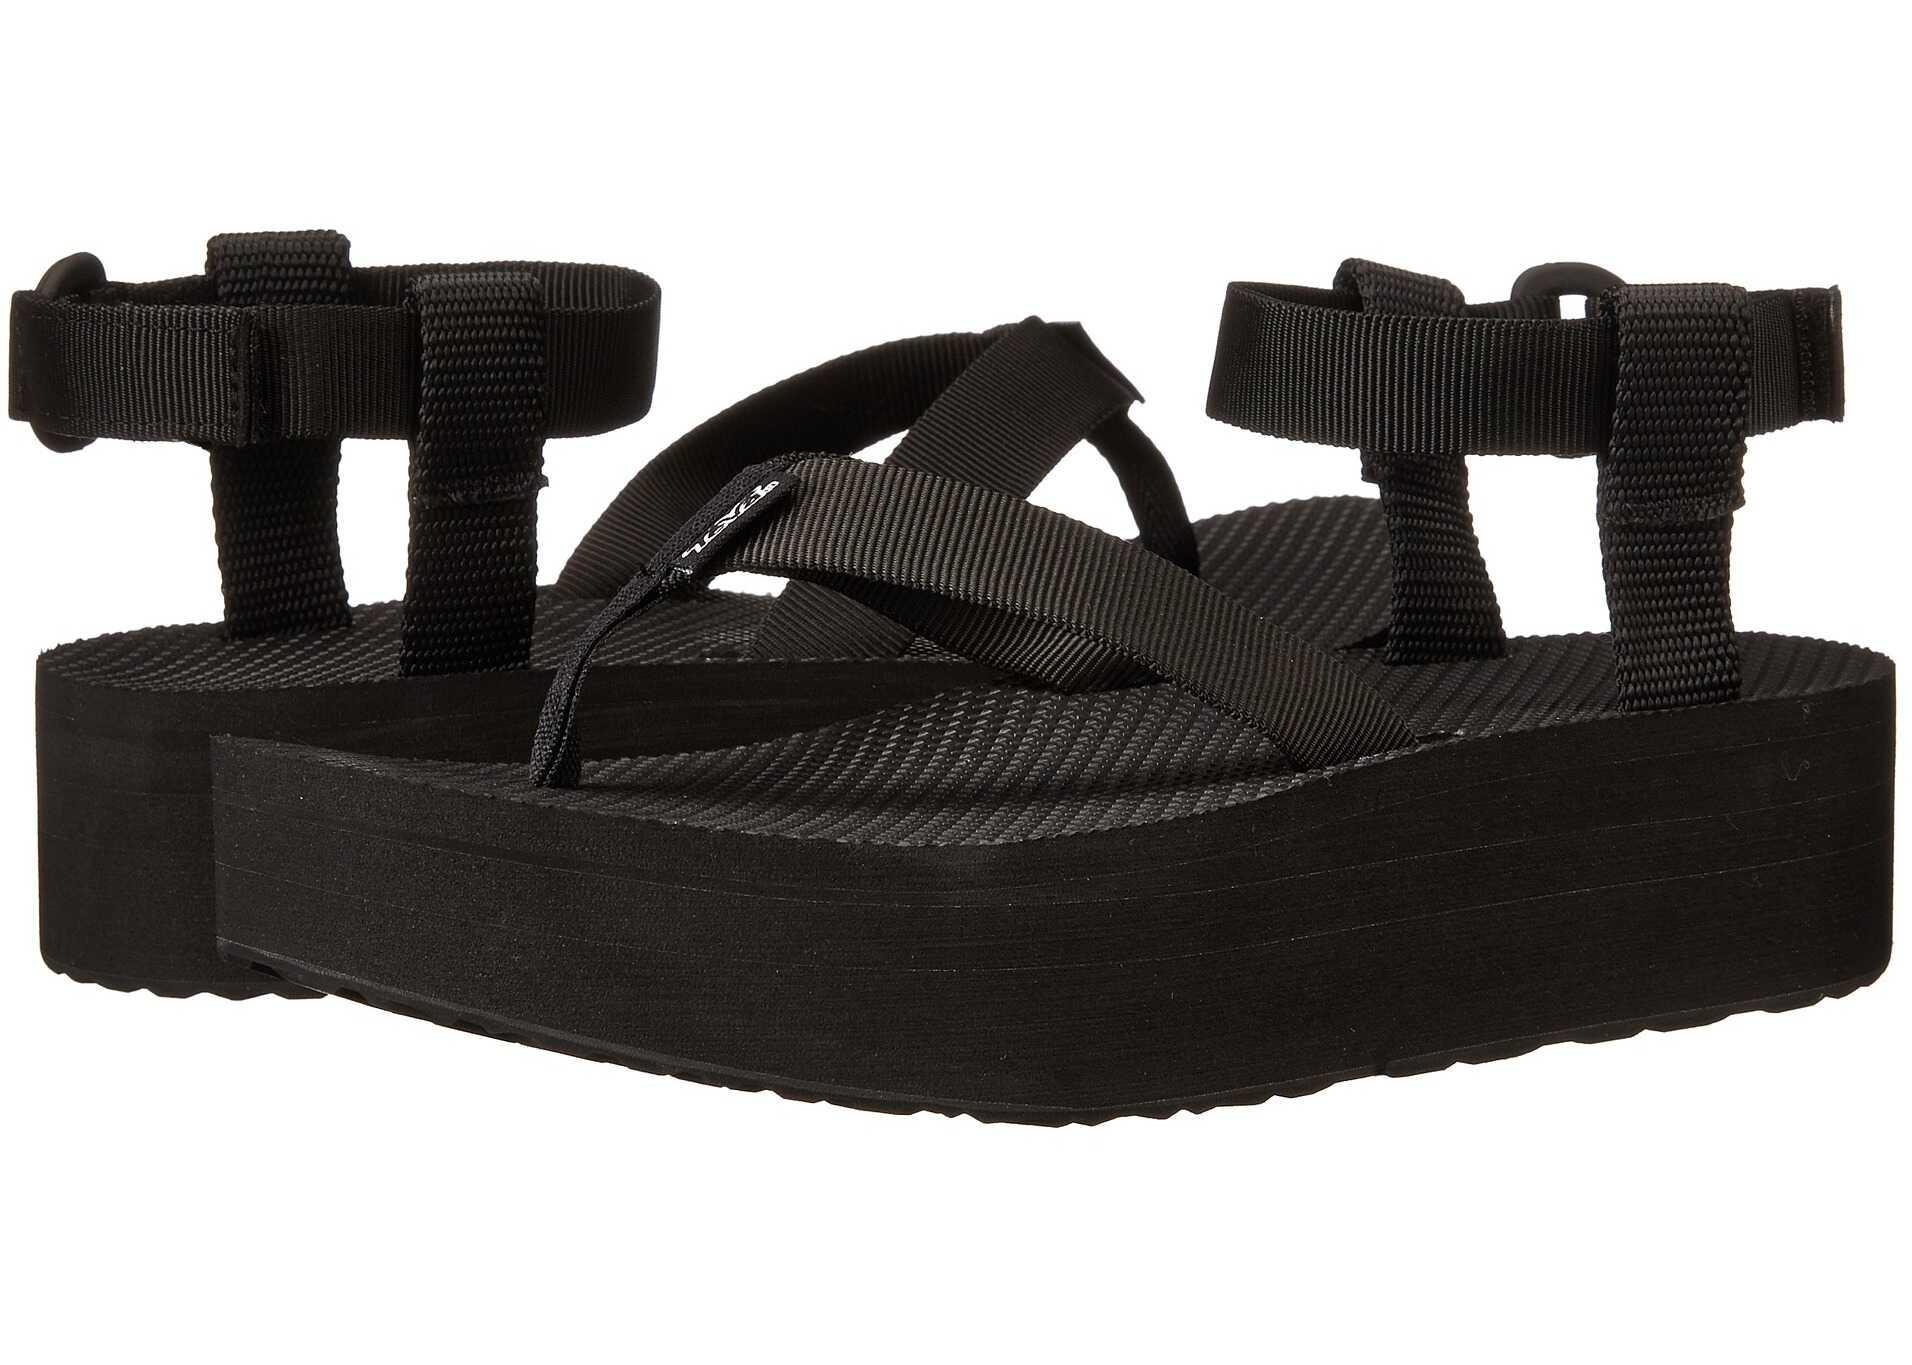 Teva Flatform Sandal Black